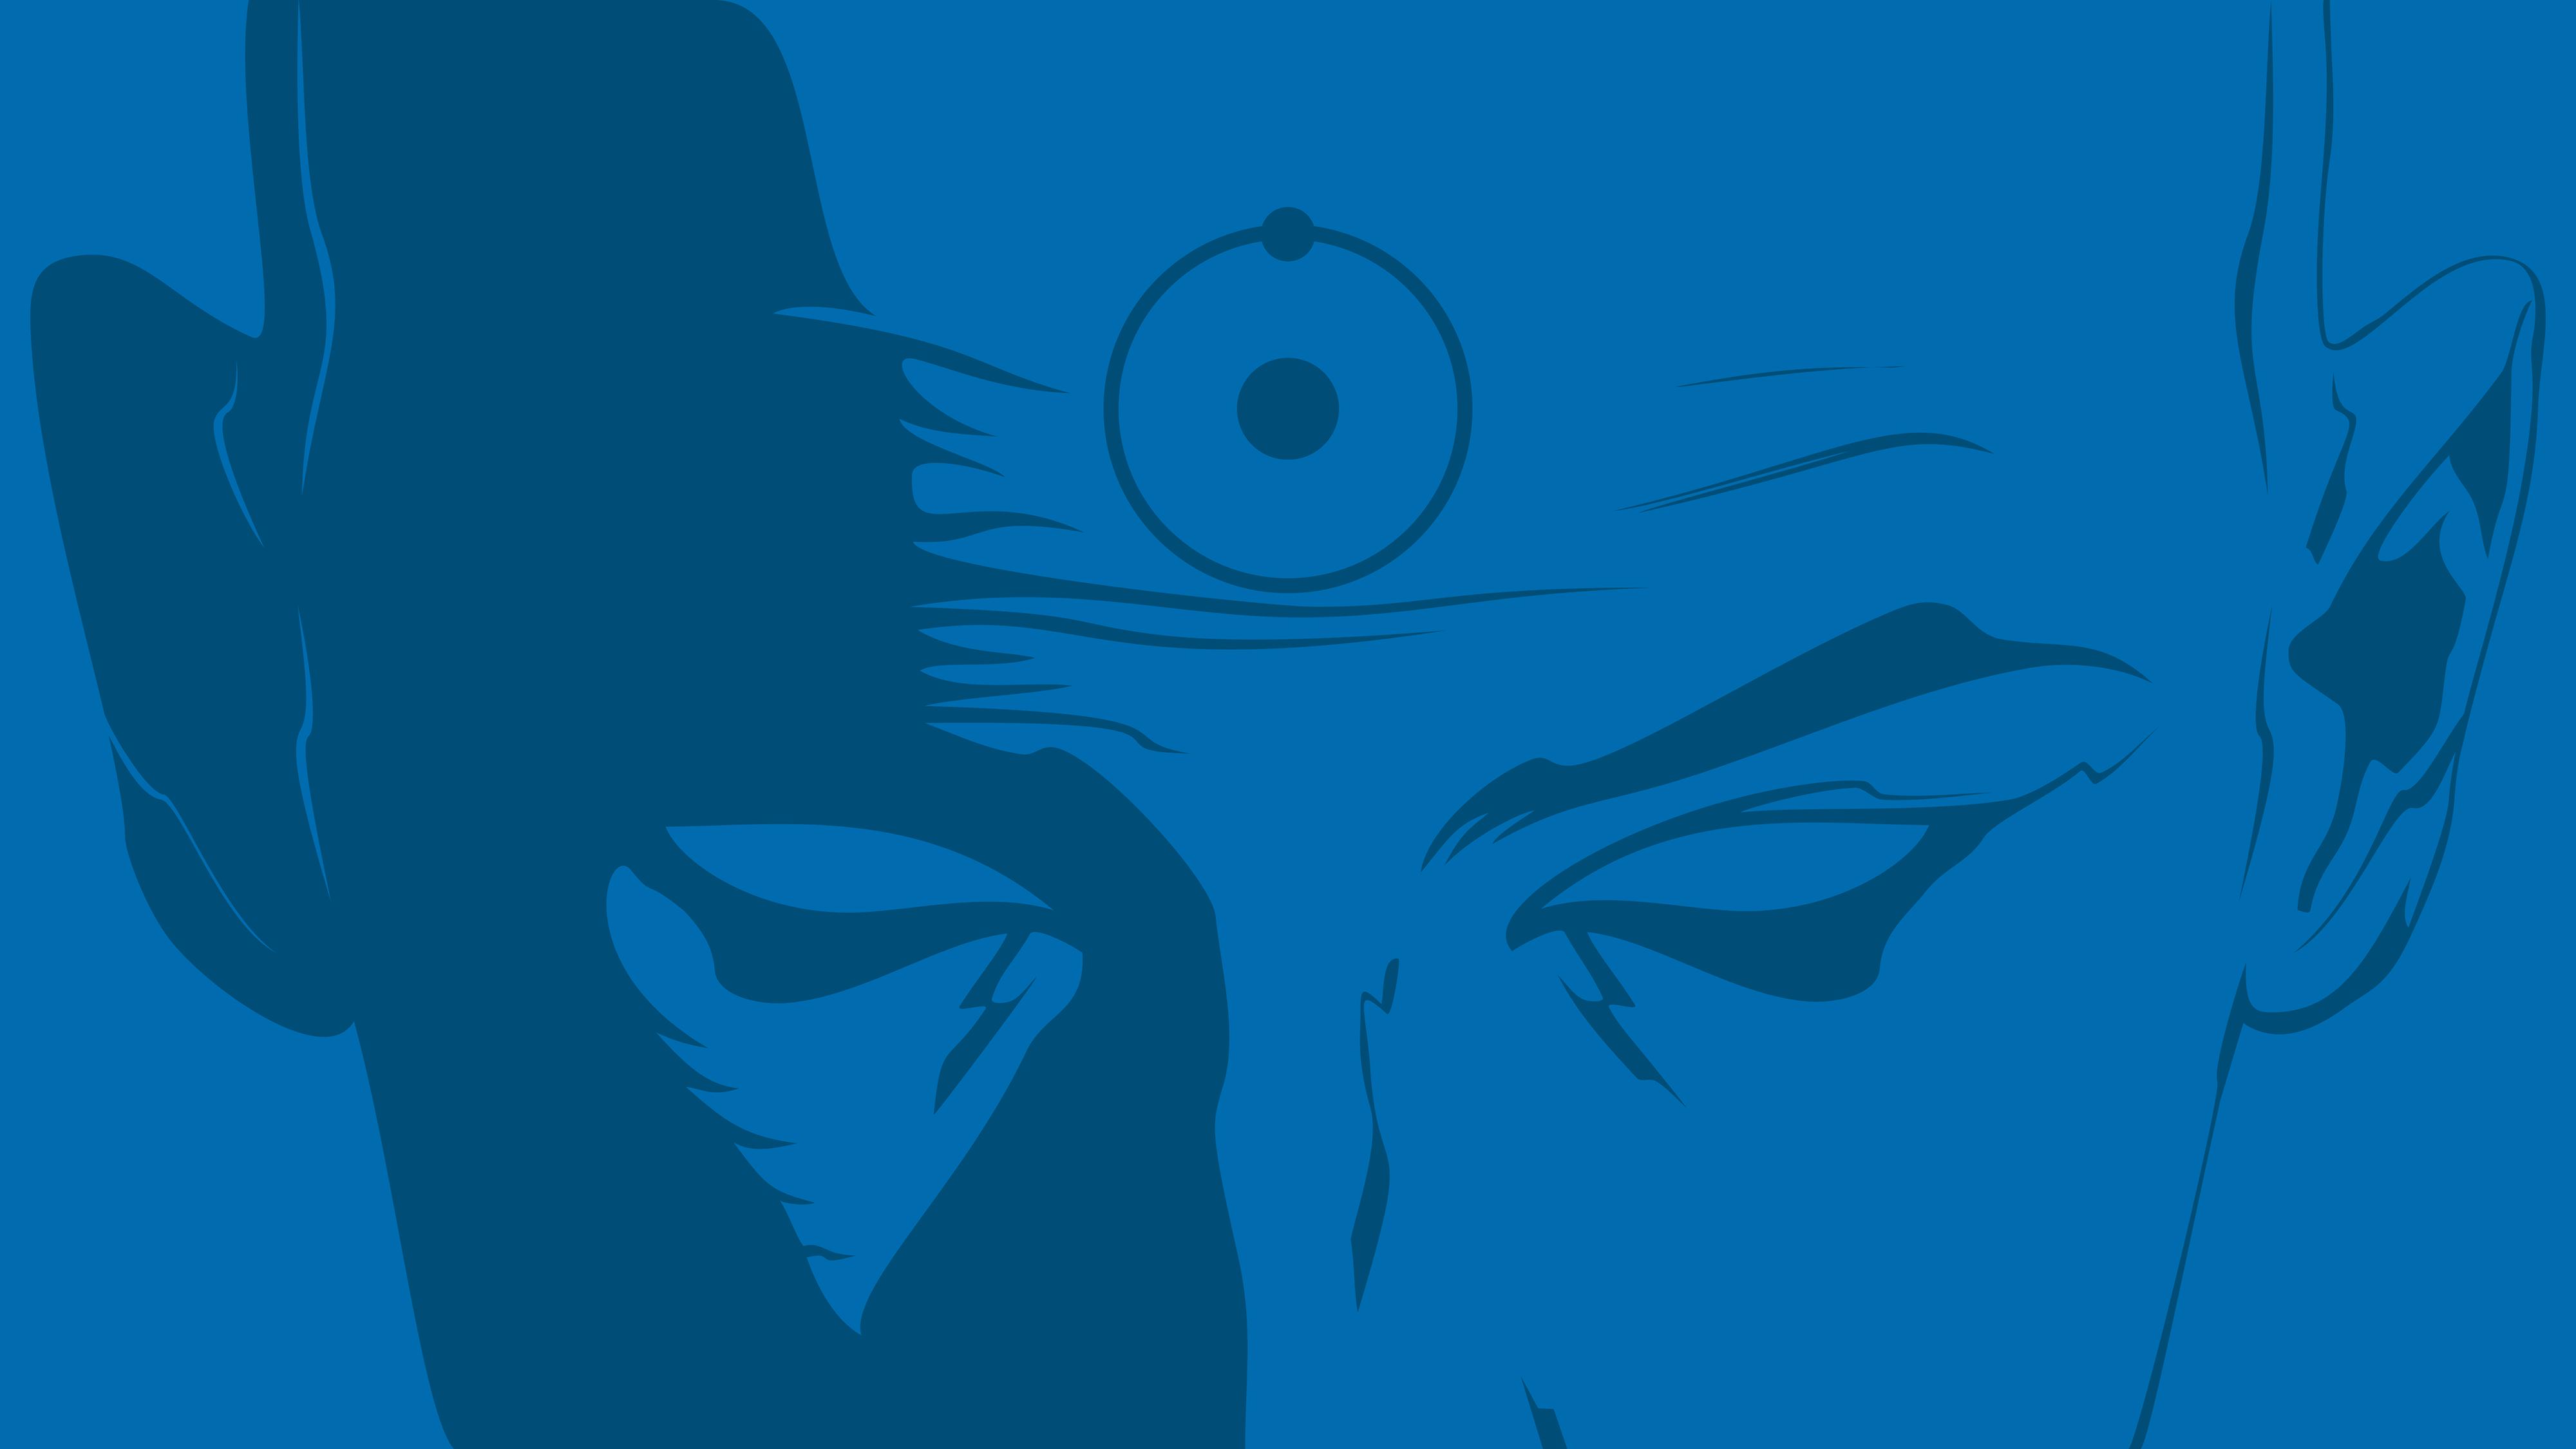 Watchmen 4k Ultra HD Wallpaper and Background 4000x2250 4000x2250